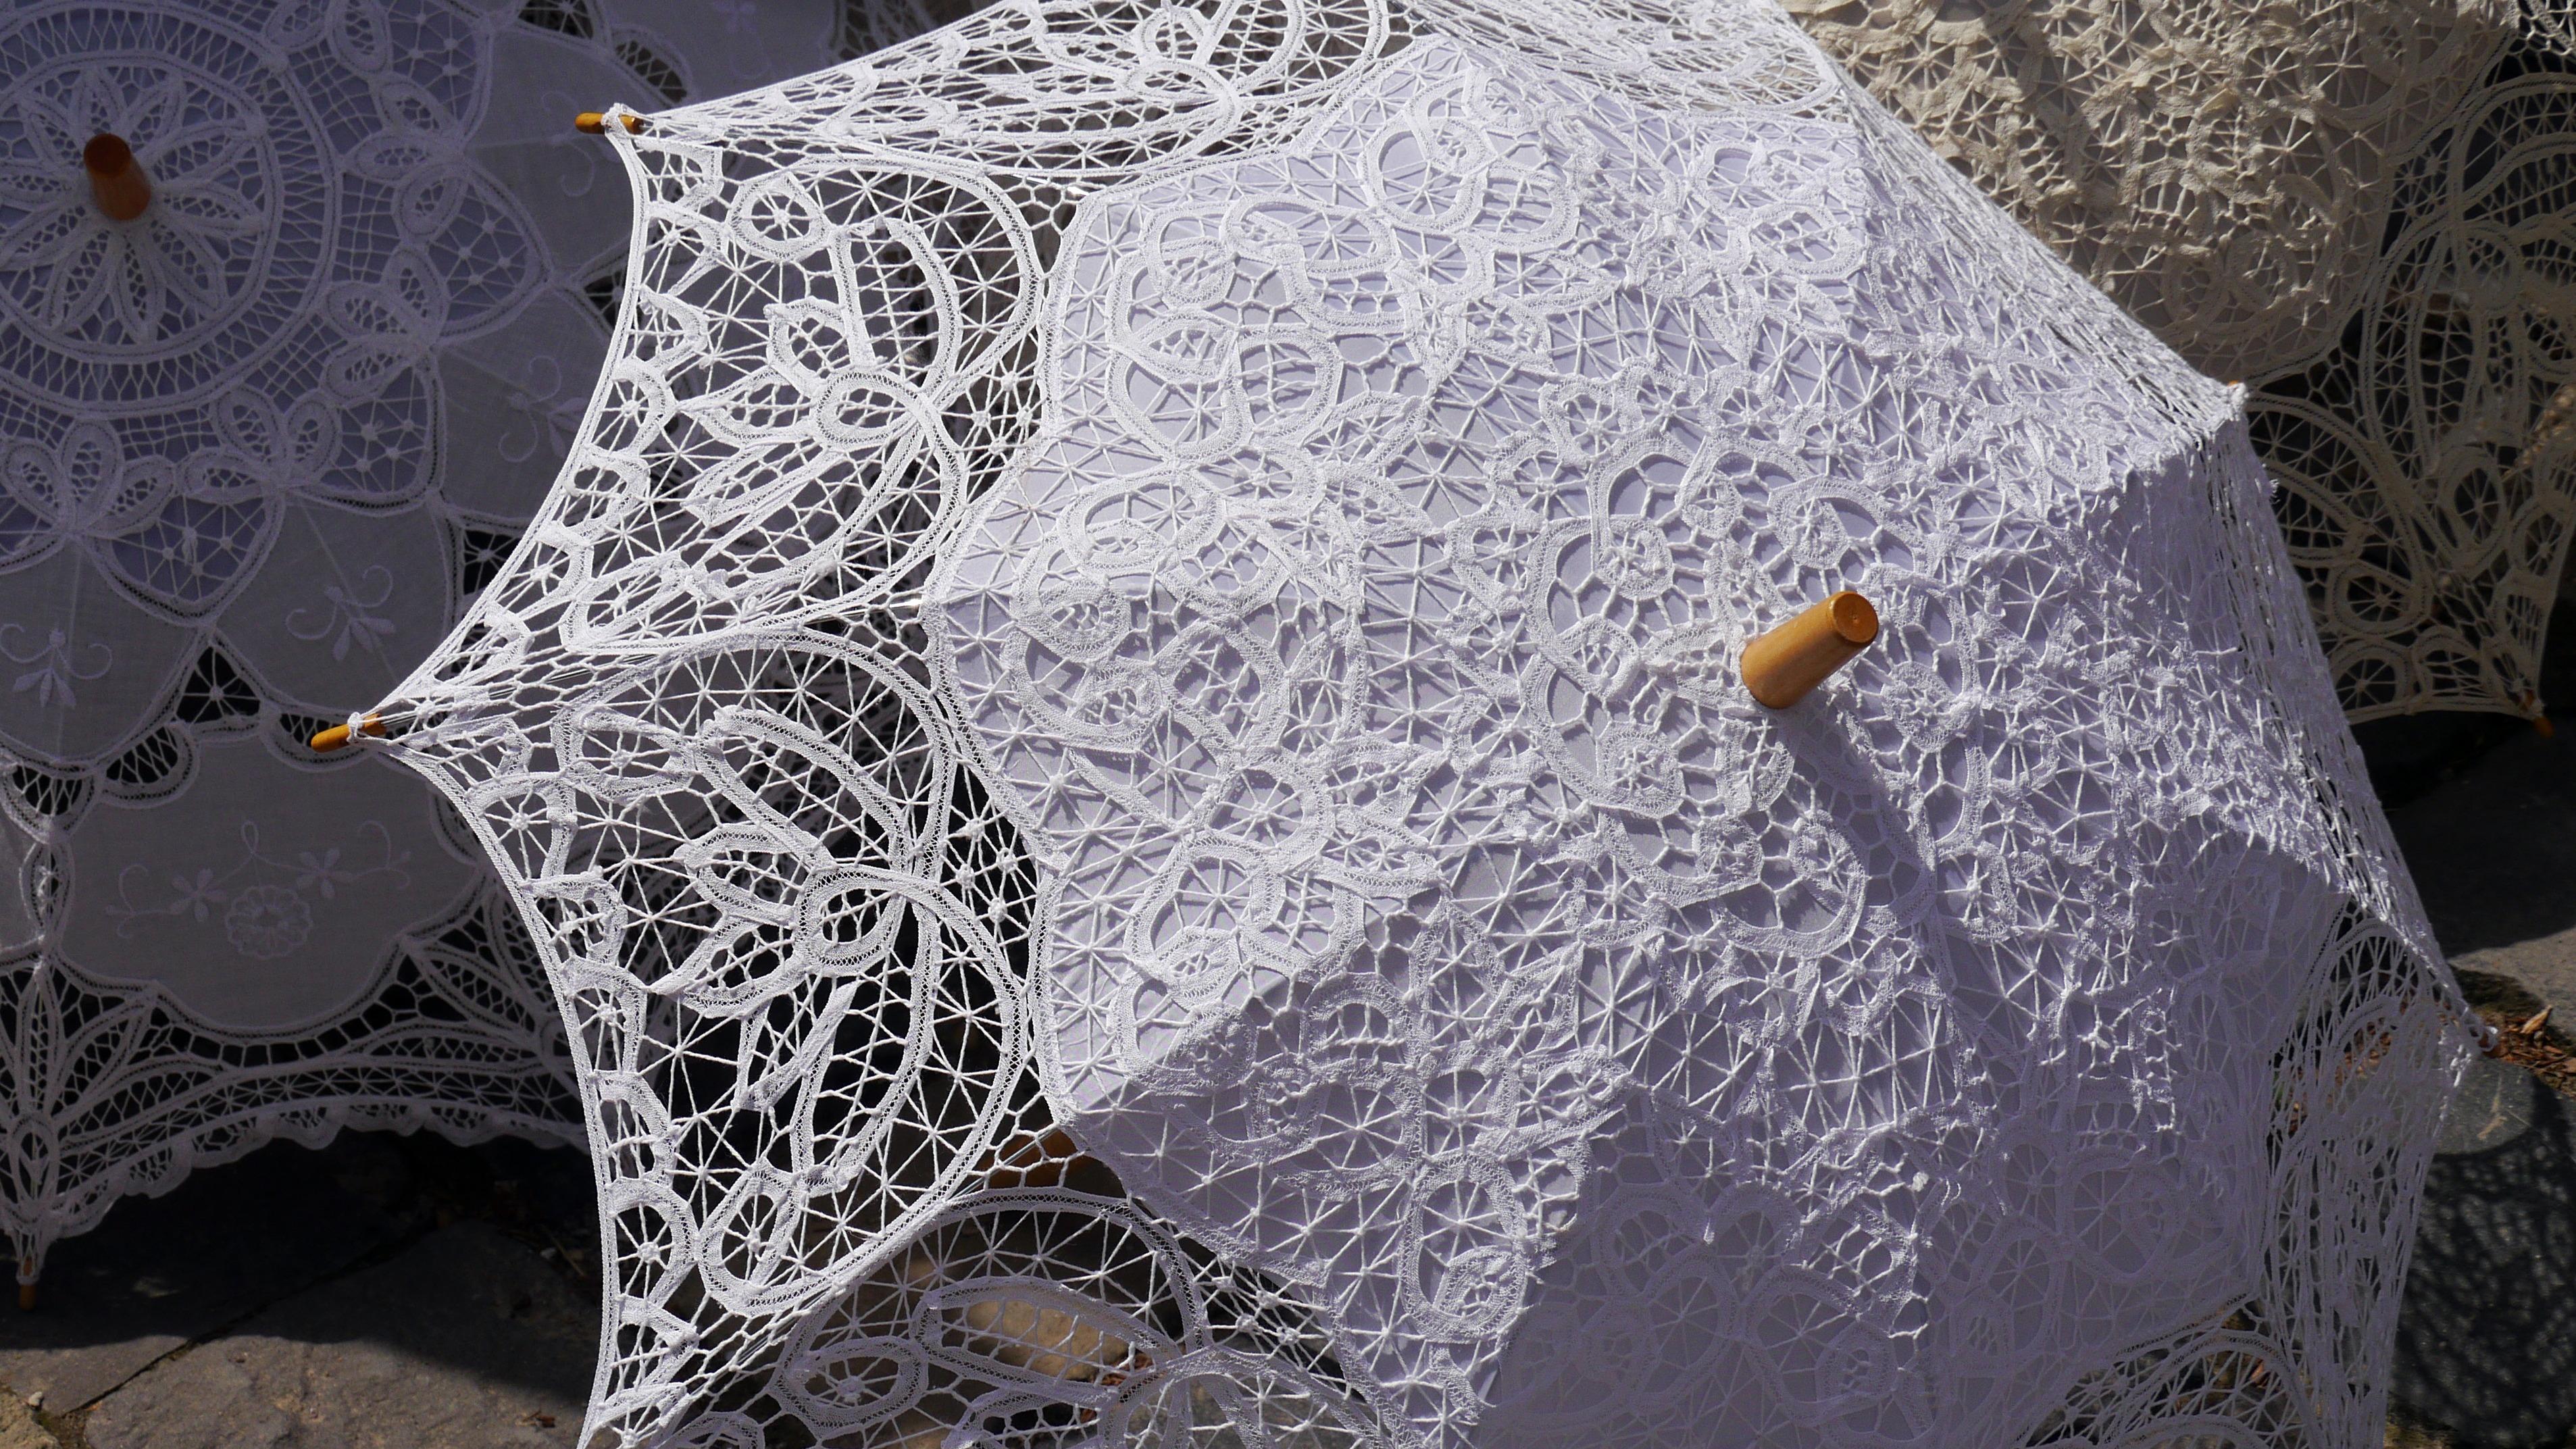 Kostenlose foto : Muster, Regenschirm, Spitze, Mode, Kleidung ...